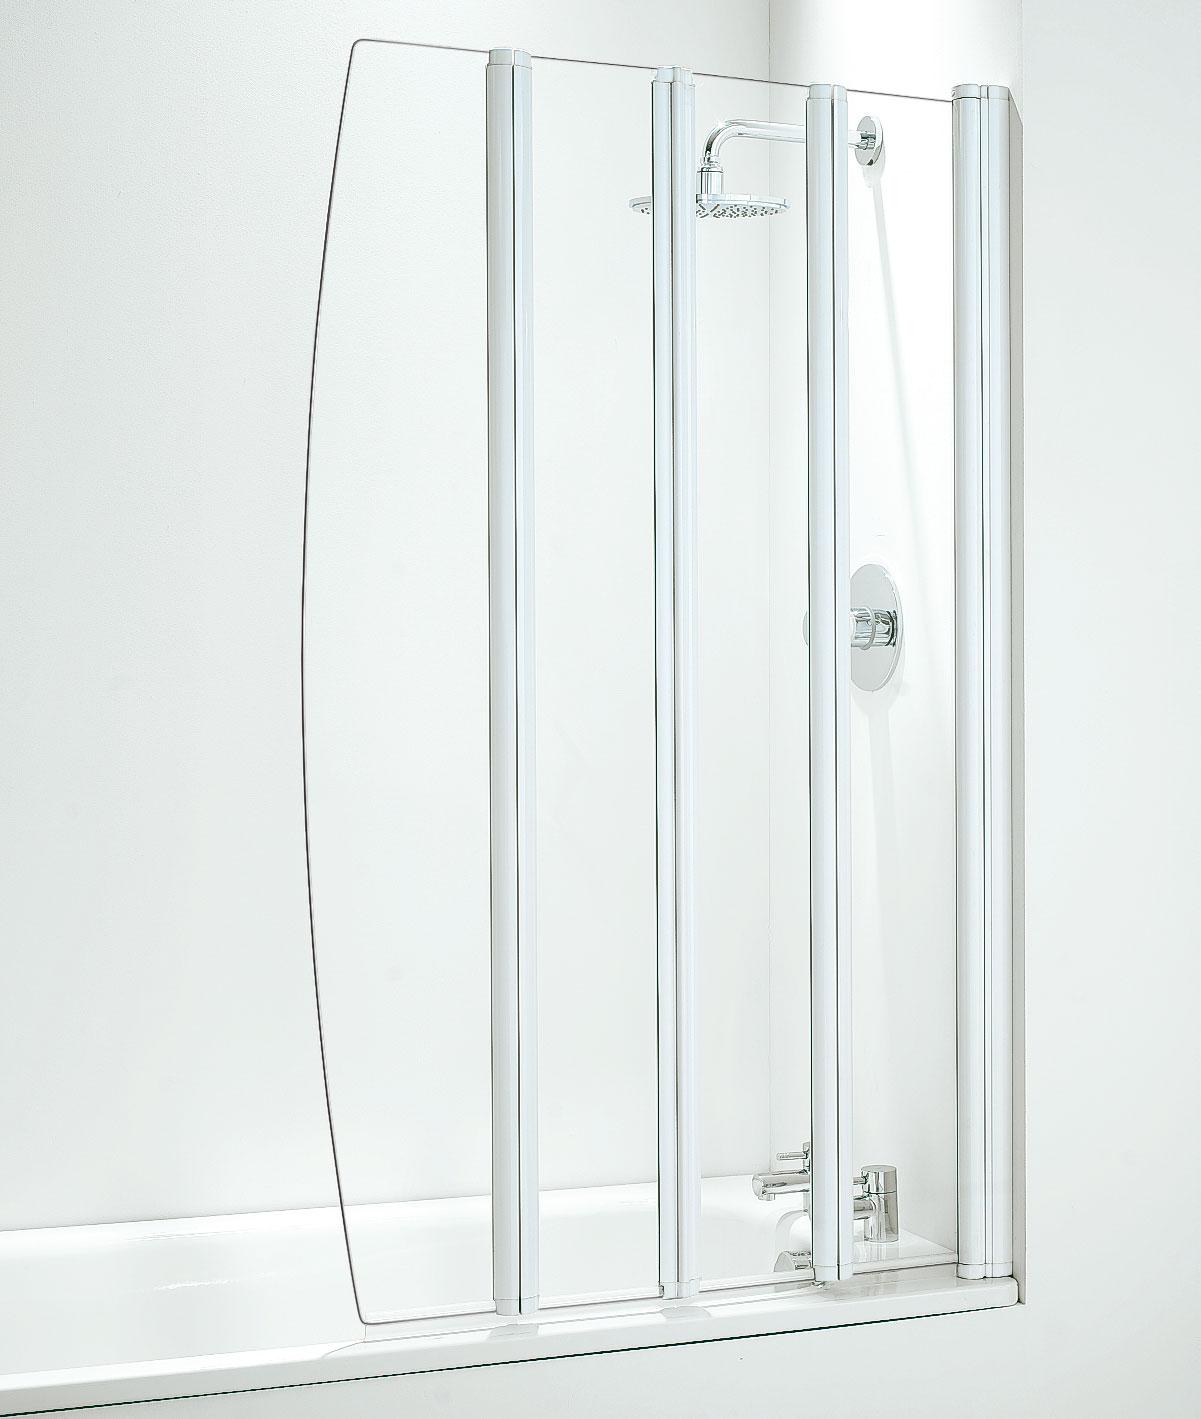 quad folding shower screen notjusttaps co uk quad folding bath shower screen